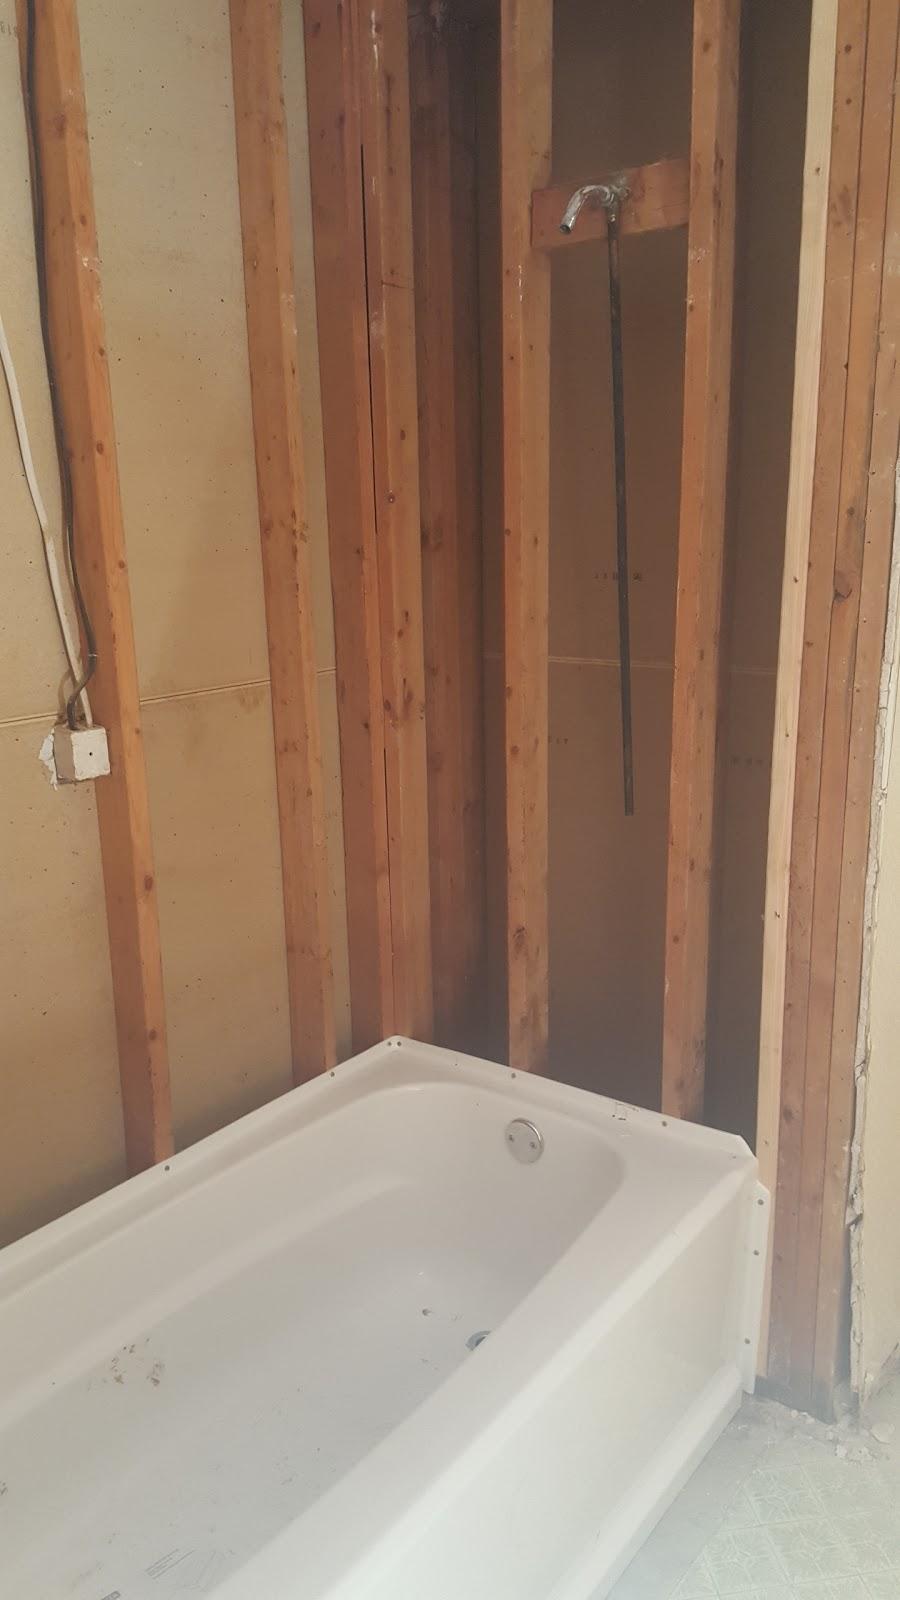 Dons Plumbing Repair And Drain Cleaning - plumber    Photo 5 of 10   Address: 1872 Saville Garden Ct, Virginia Beach, VA 23453, USA   Phone: (757) 309-0001